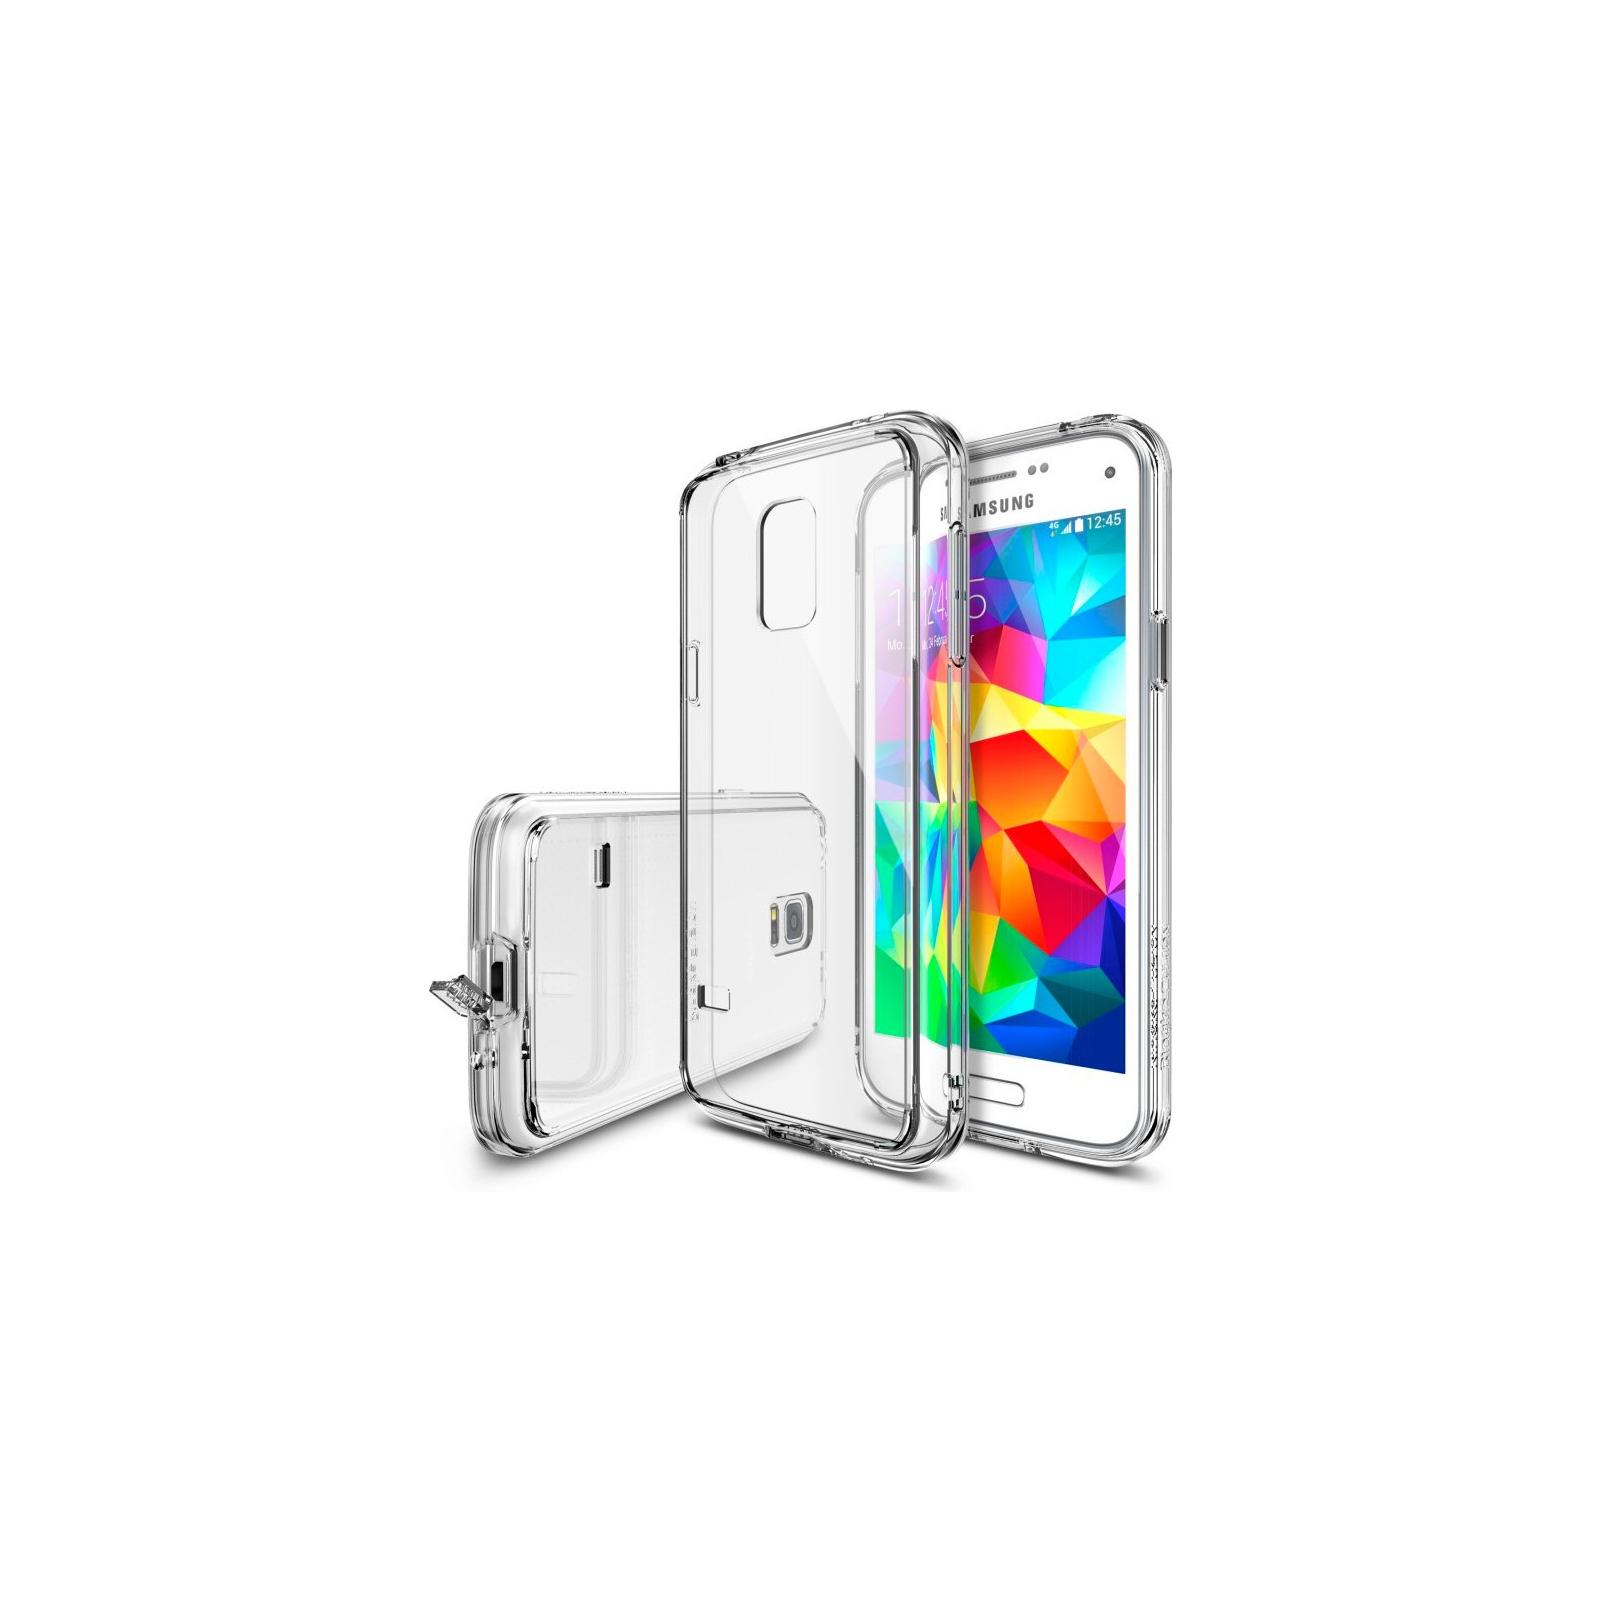 Чехол для моб. телефона Ringke Fusion для Samsung Galaxy S5 mini (Crystal View) (550661)